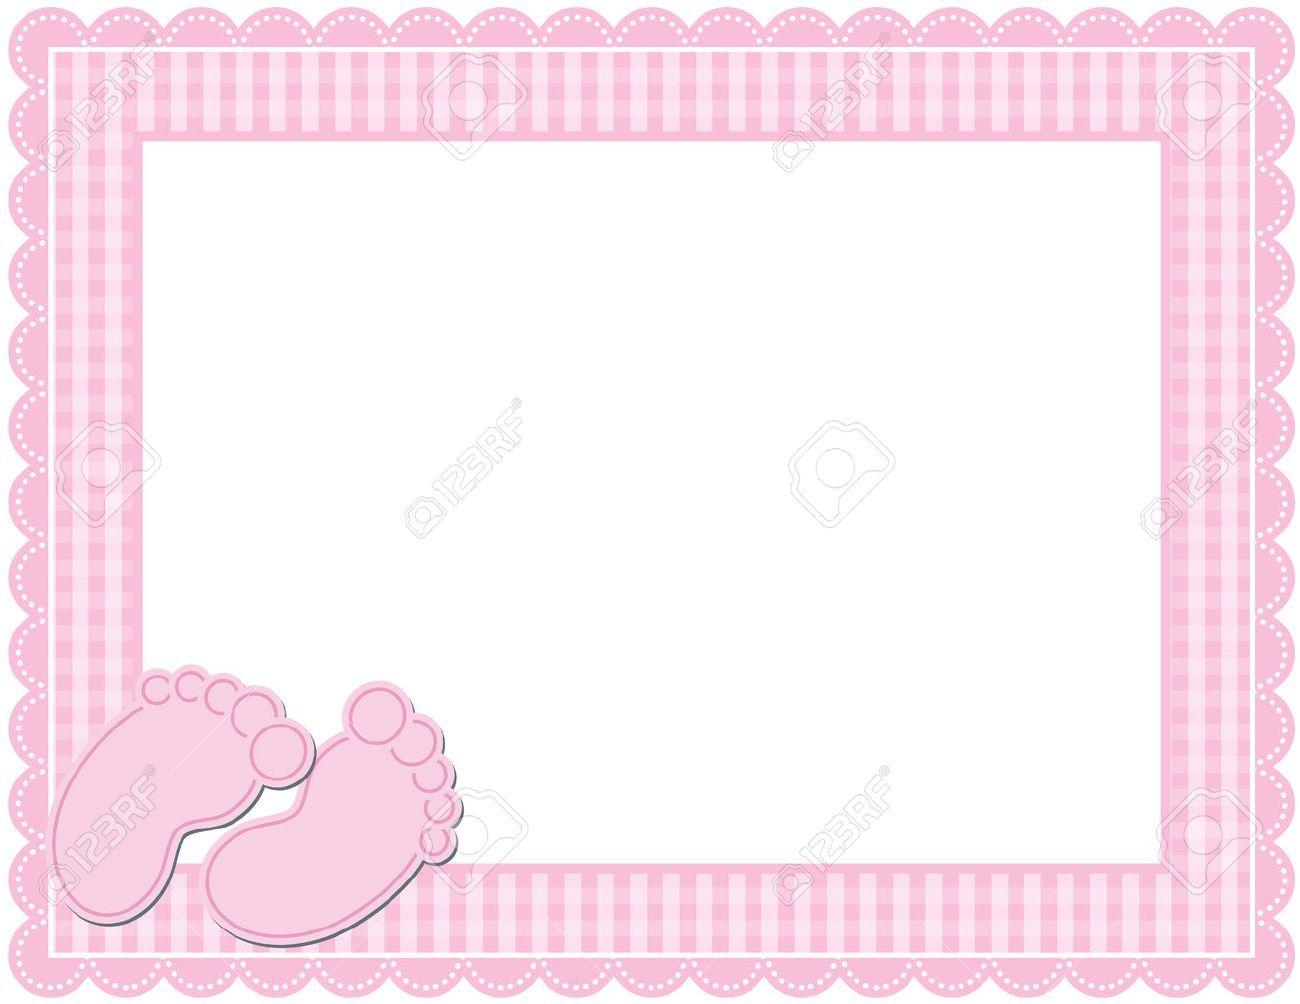 Baby girl clipart border 5 » Clipart Portal.